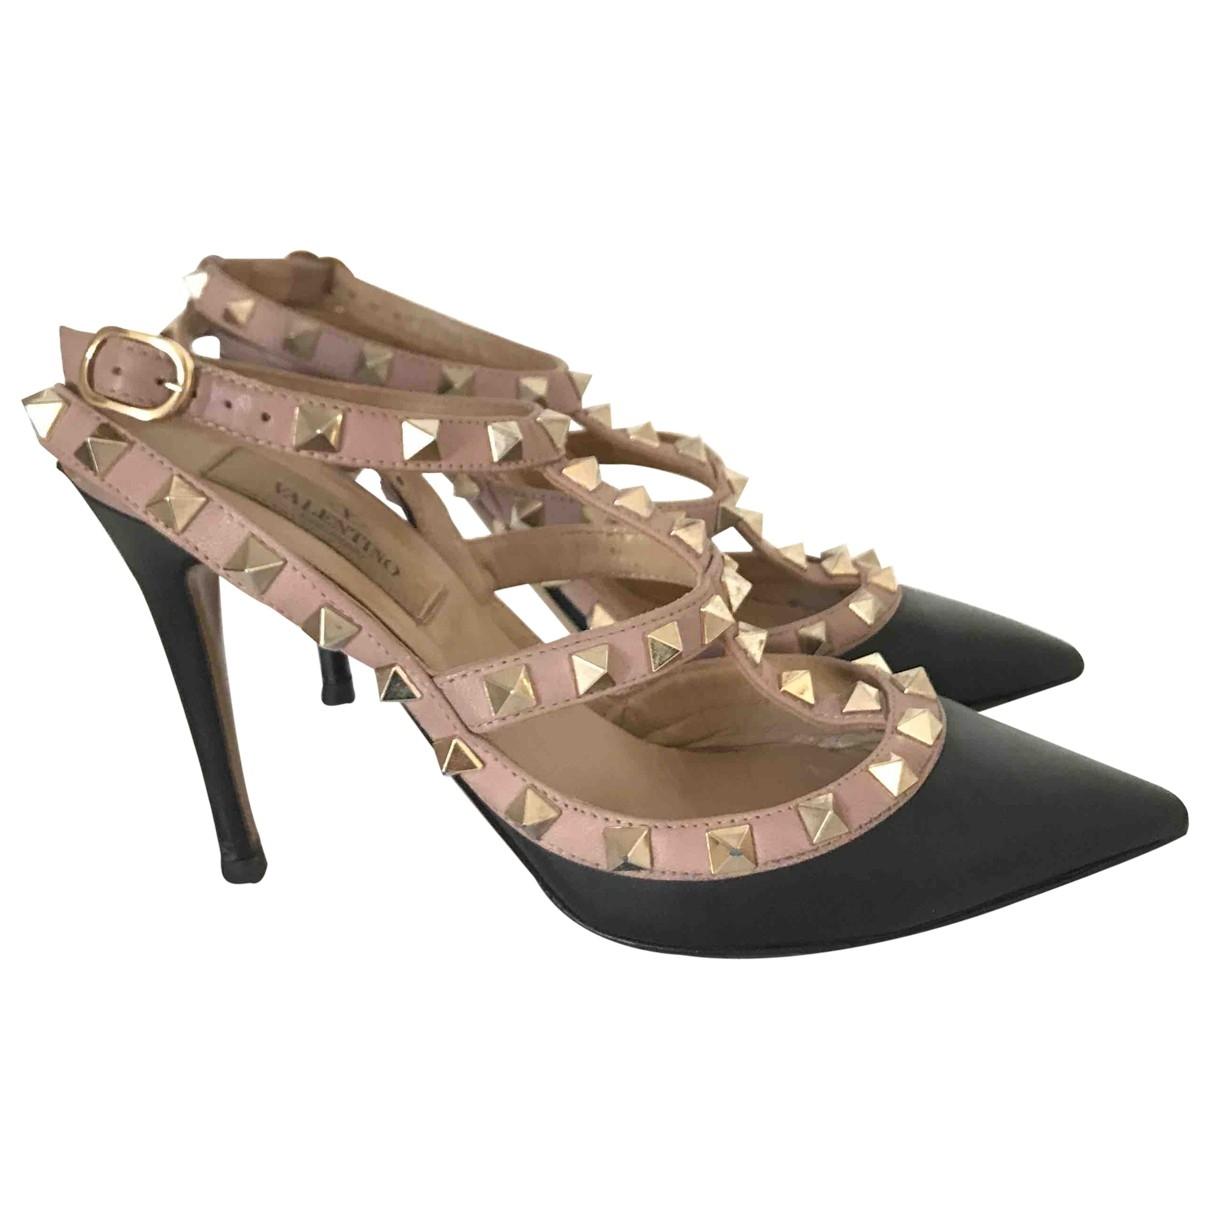 Valentino Garavani Rockstud Black Leather Heels for Women 35 EU